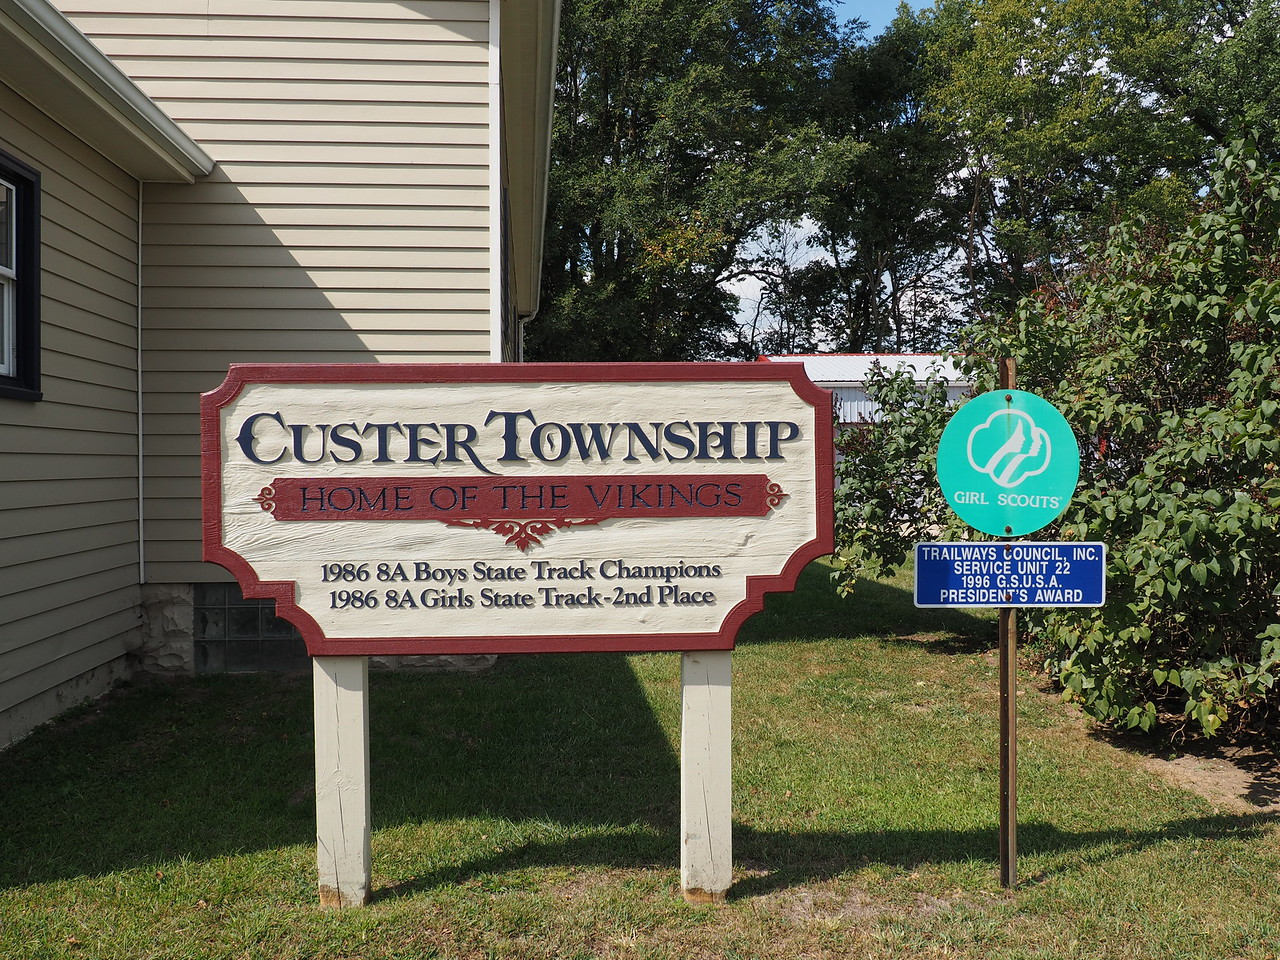 Custer Township sign